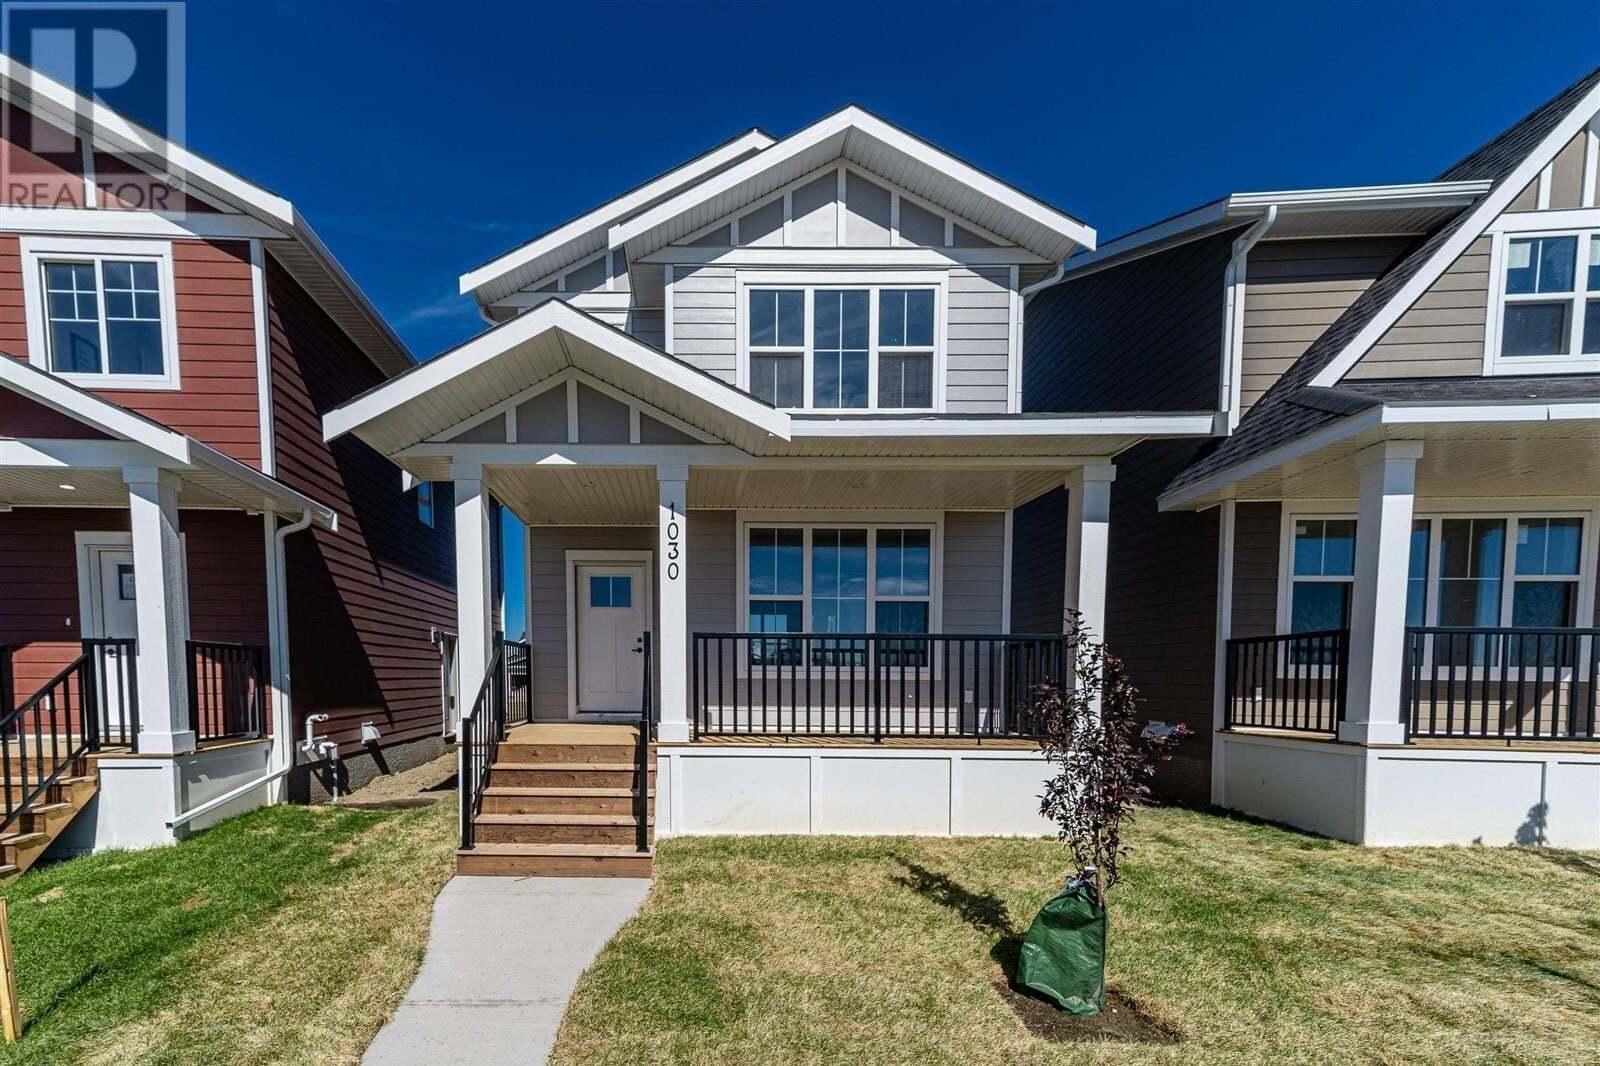 House for sale at 1030 Stilling St Saskatoon Saskatchewan - MLS: SK821363